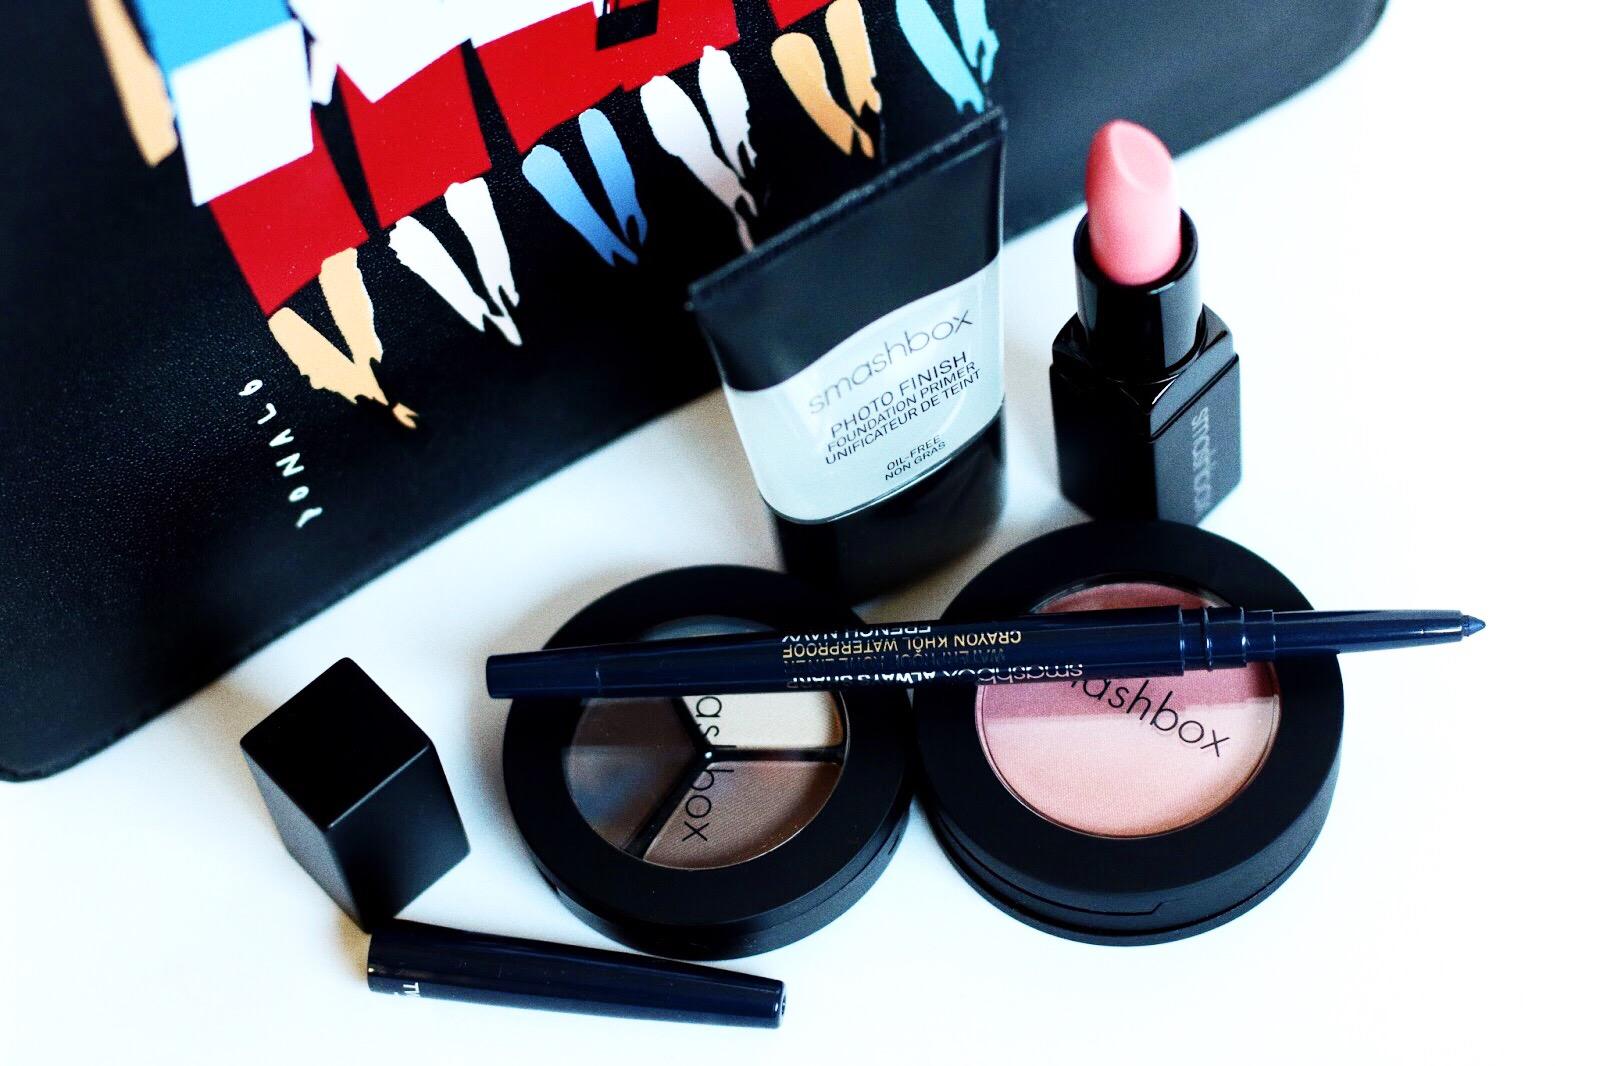 smashbox donald robertson pochette maquillage colette avis test swatches